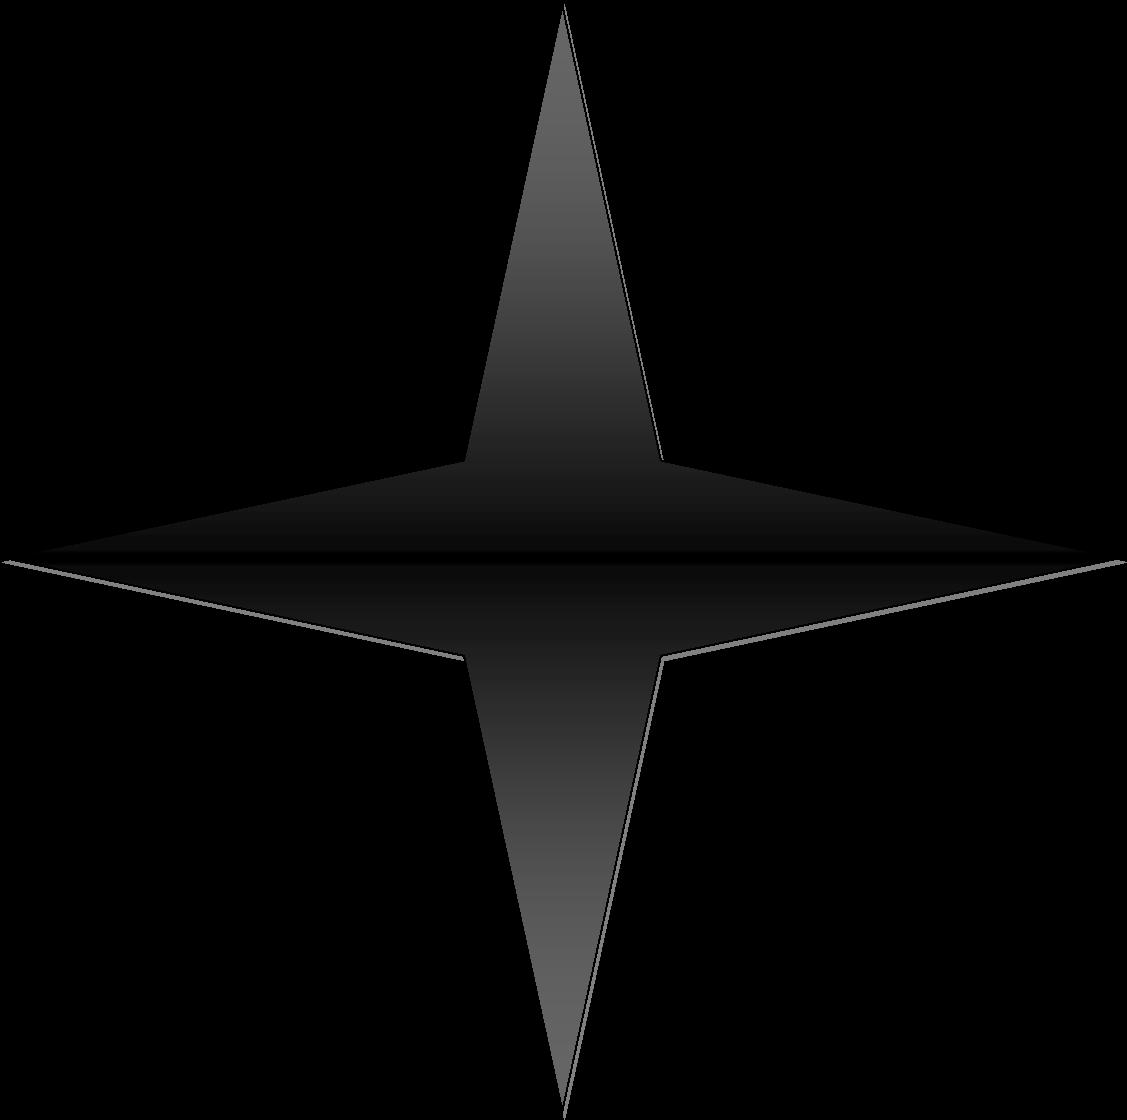 Sparkle Clipart Four Pointed Star.